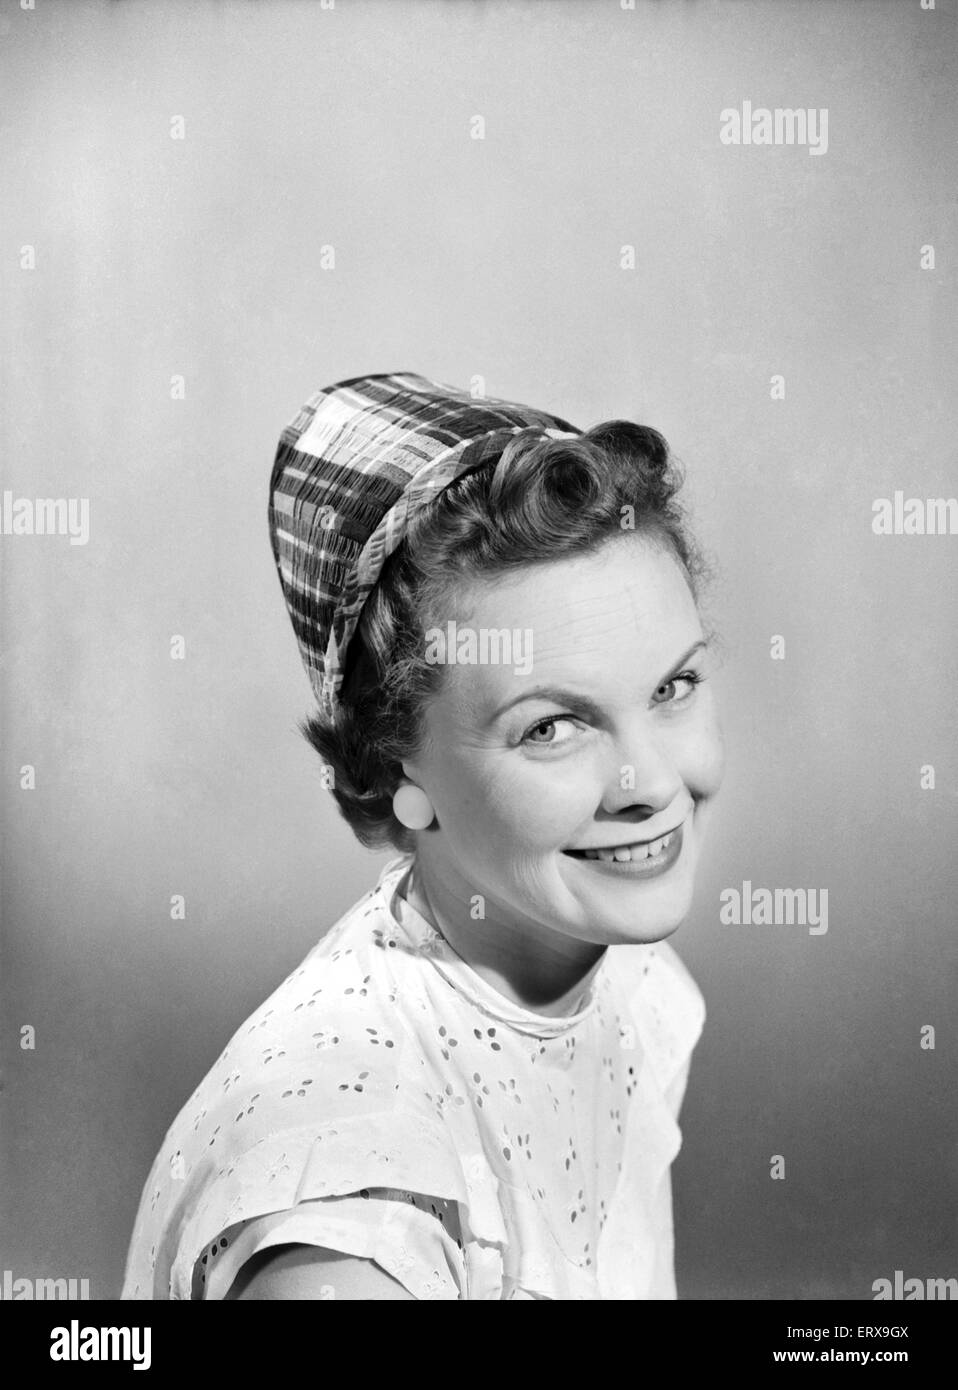 Damenbekleidung, Mode, Hüte. 1955 Stockbild